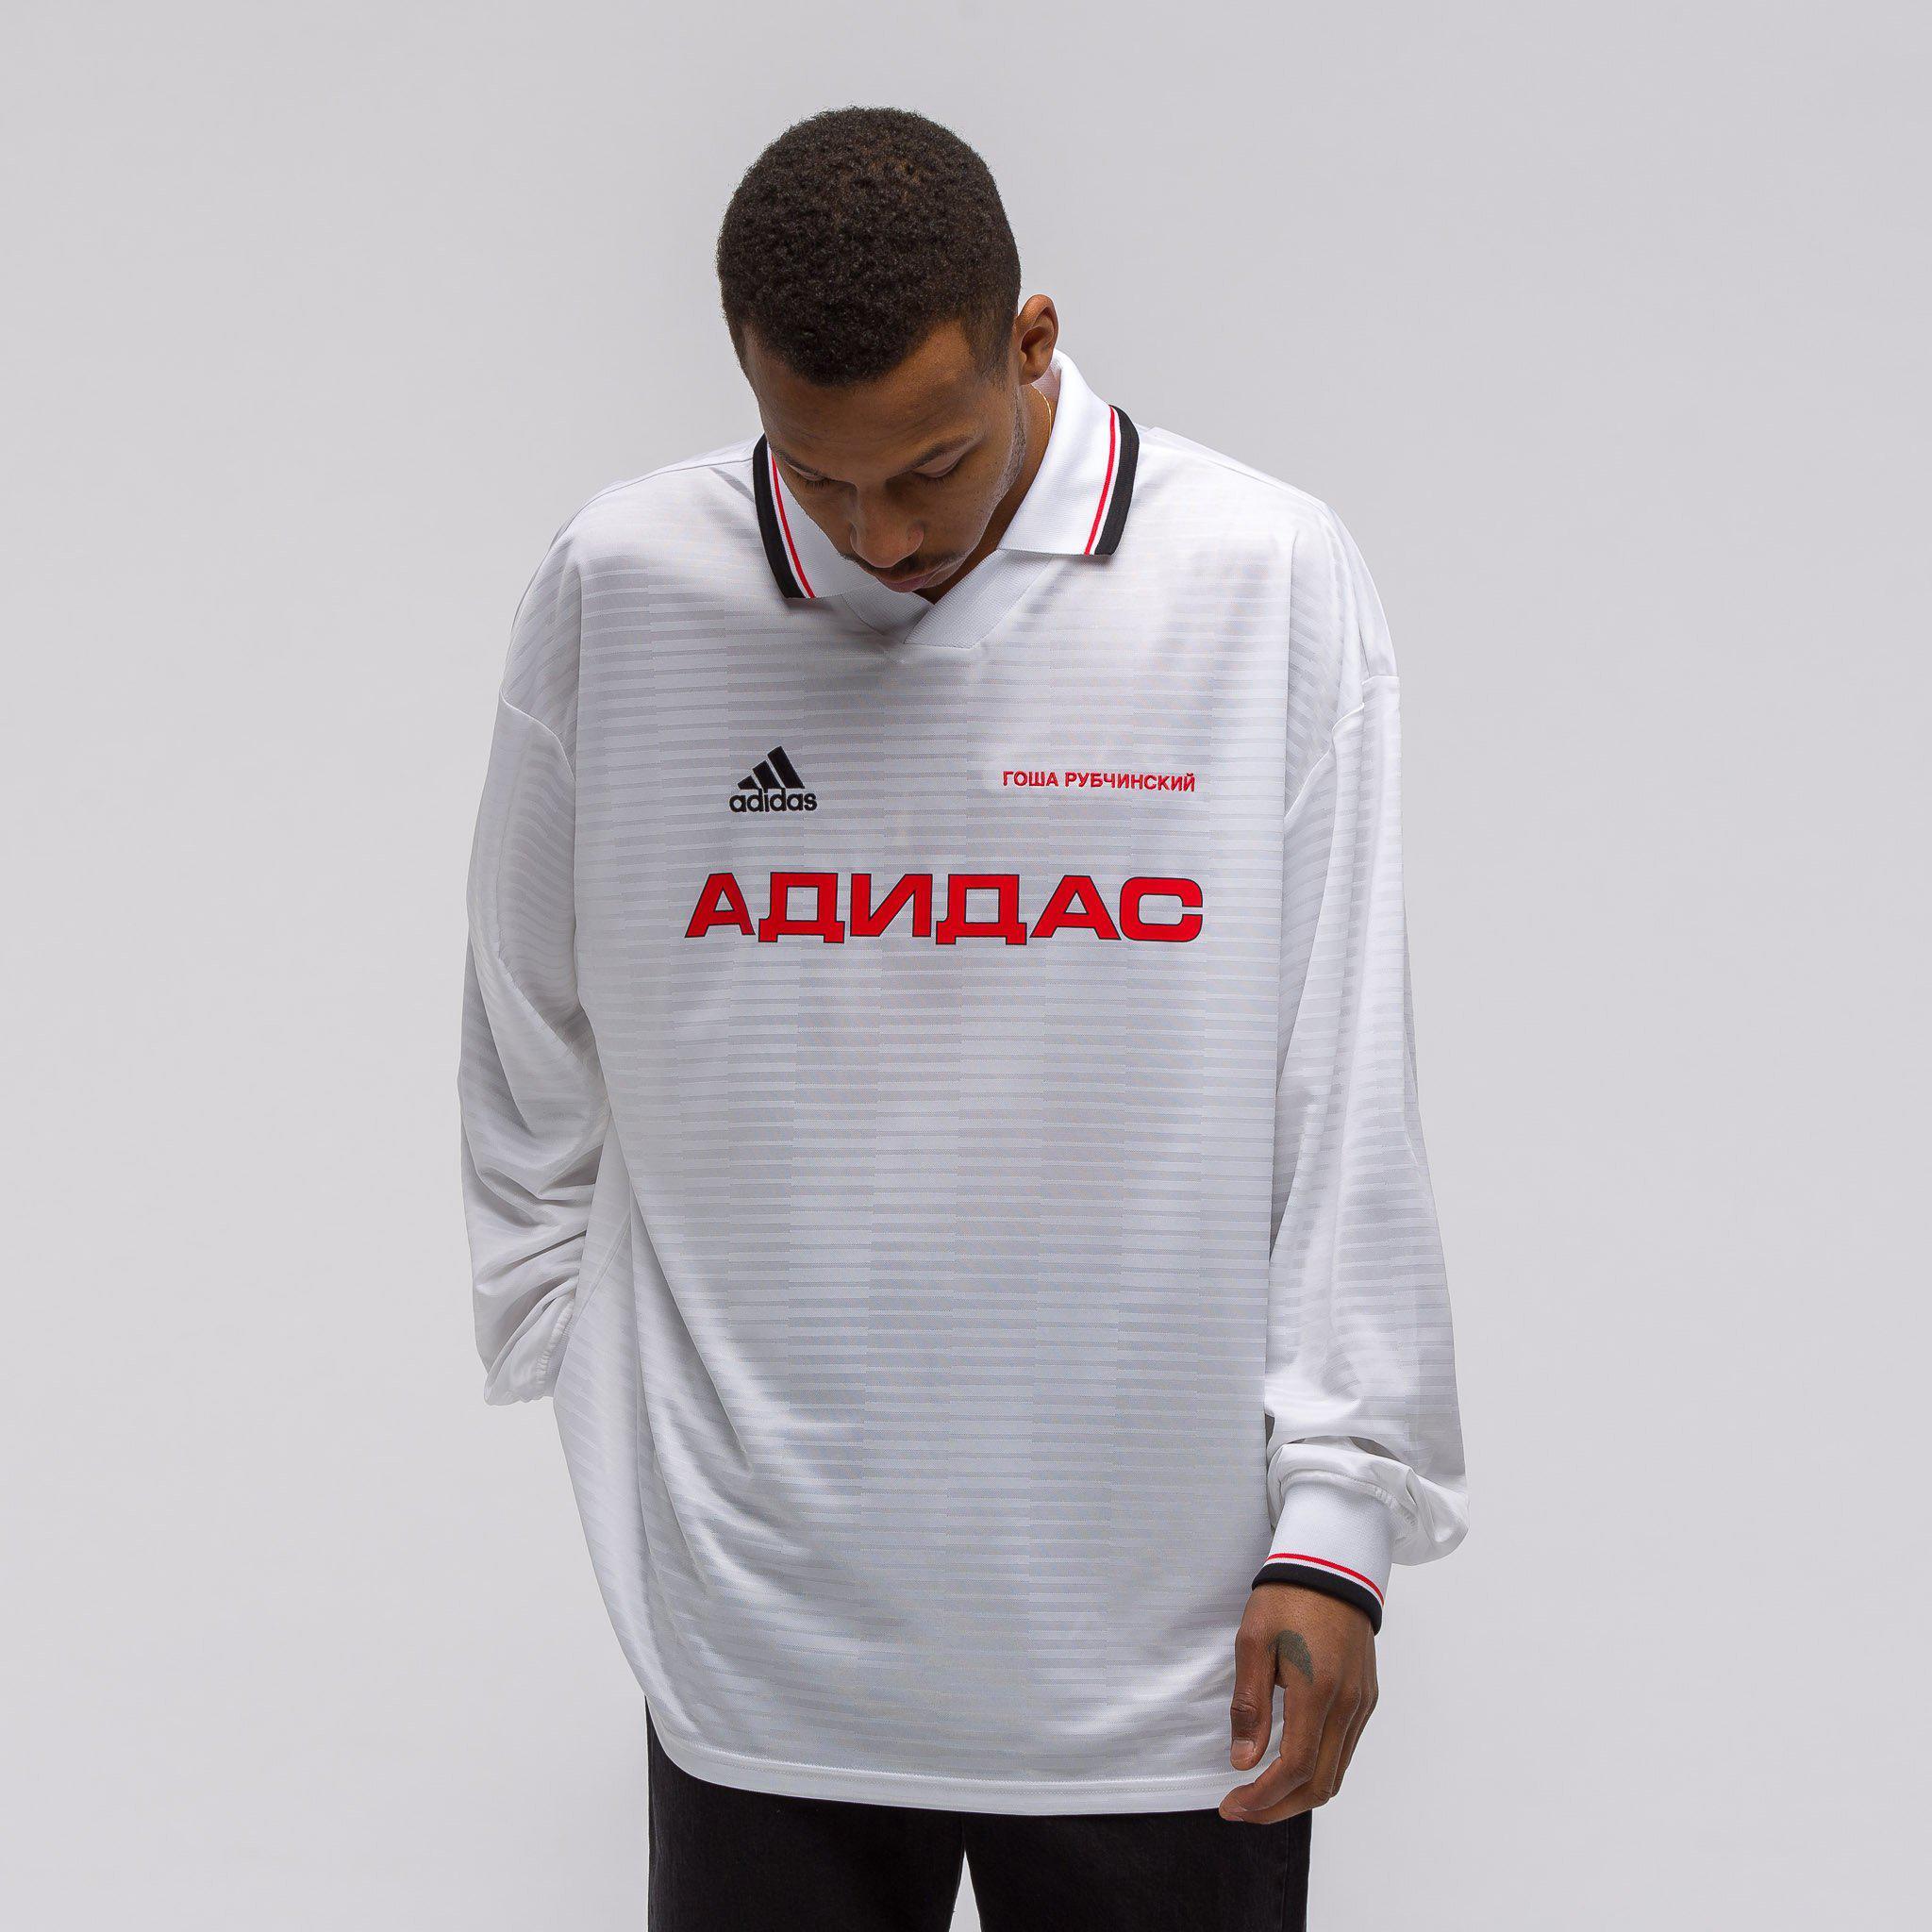 51eeb0b99d2 Gosha Rubchinskiy X Adidas Long Sleeve Jersey Top In White in White ...